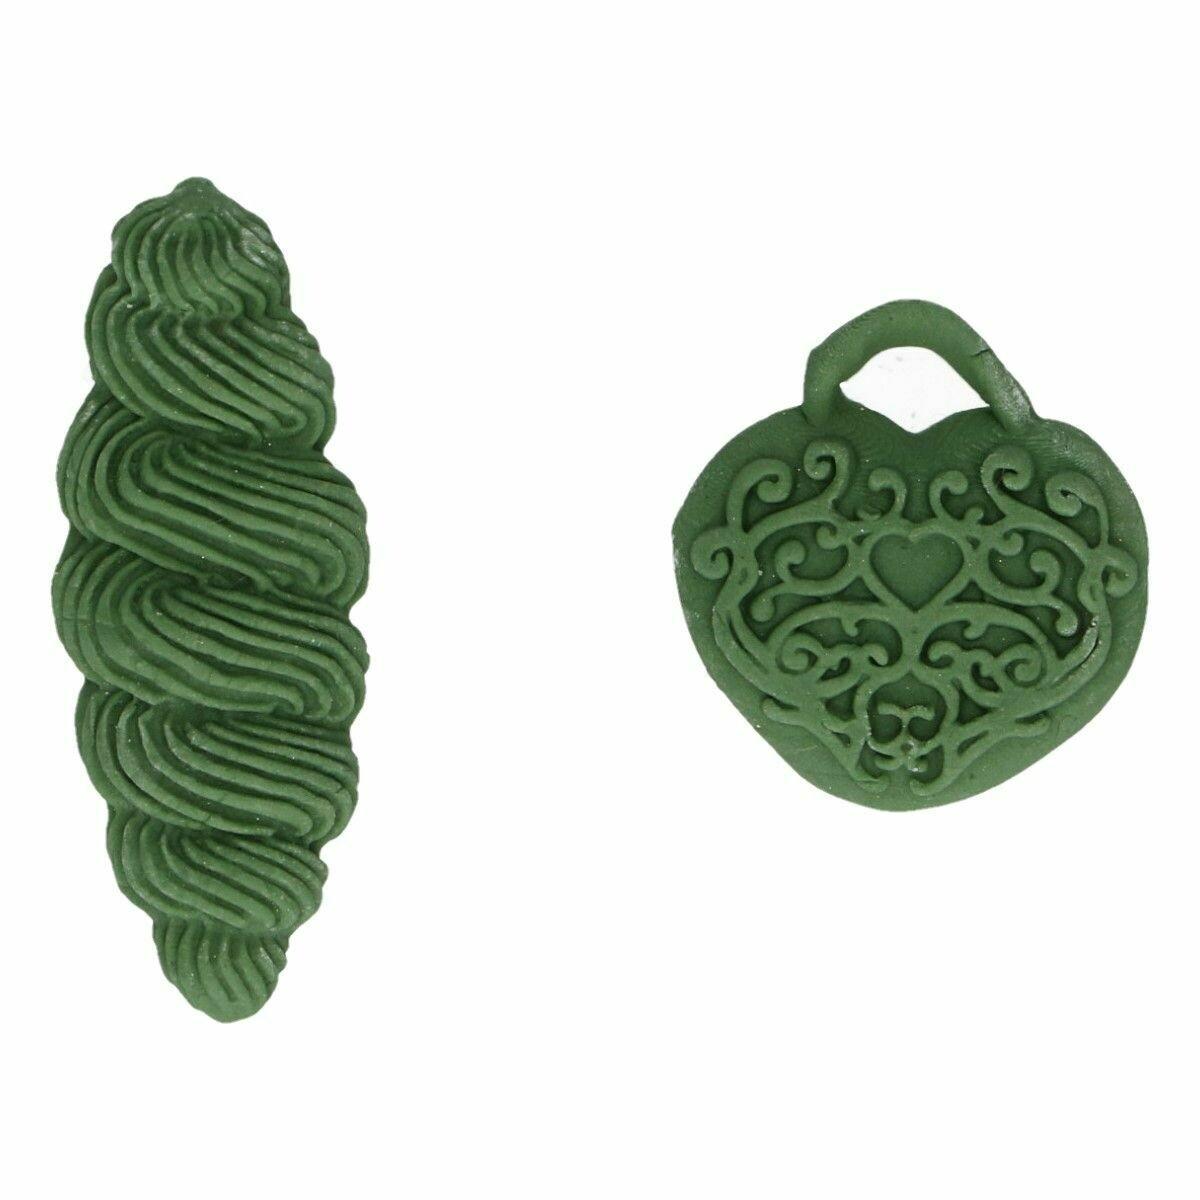 FunCakes FunColours GEL -LEAF GREEN -Χρώμα Πάστας -Πράσινο Φύλλο 30γρ